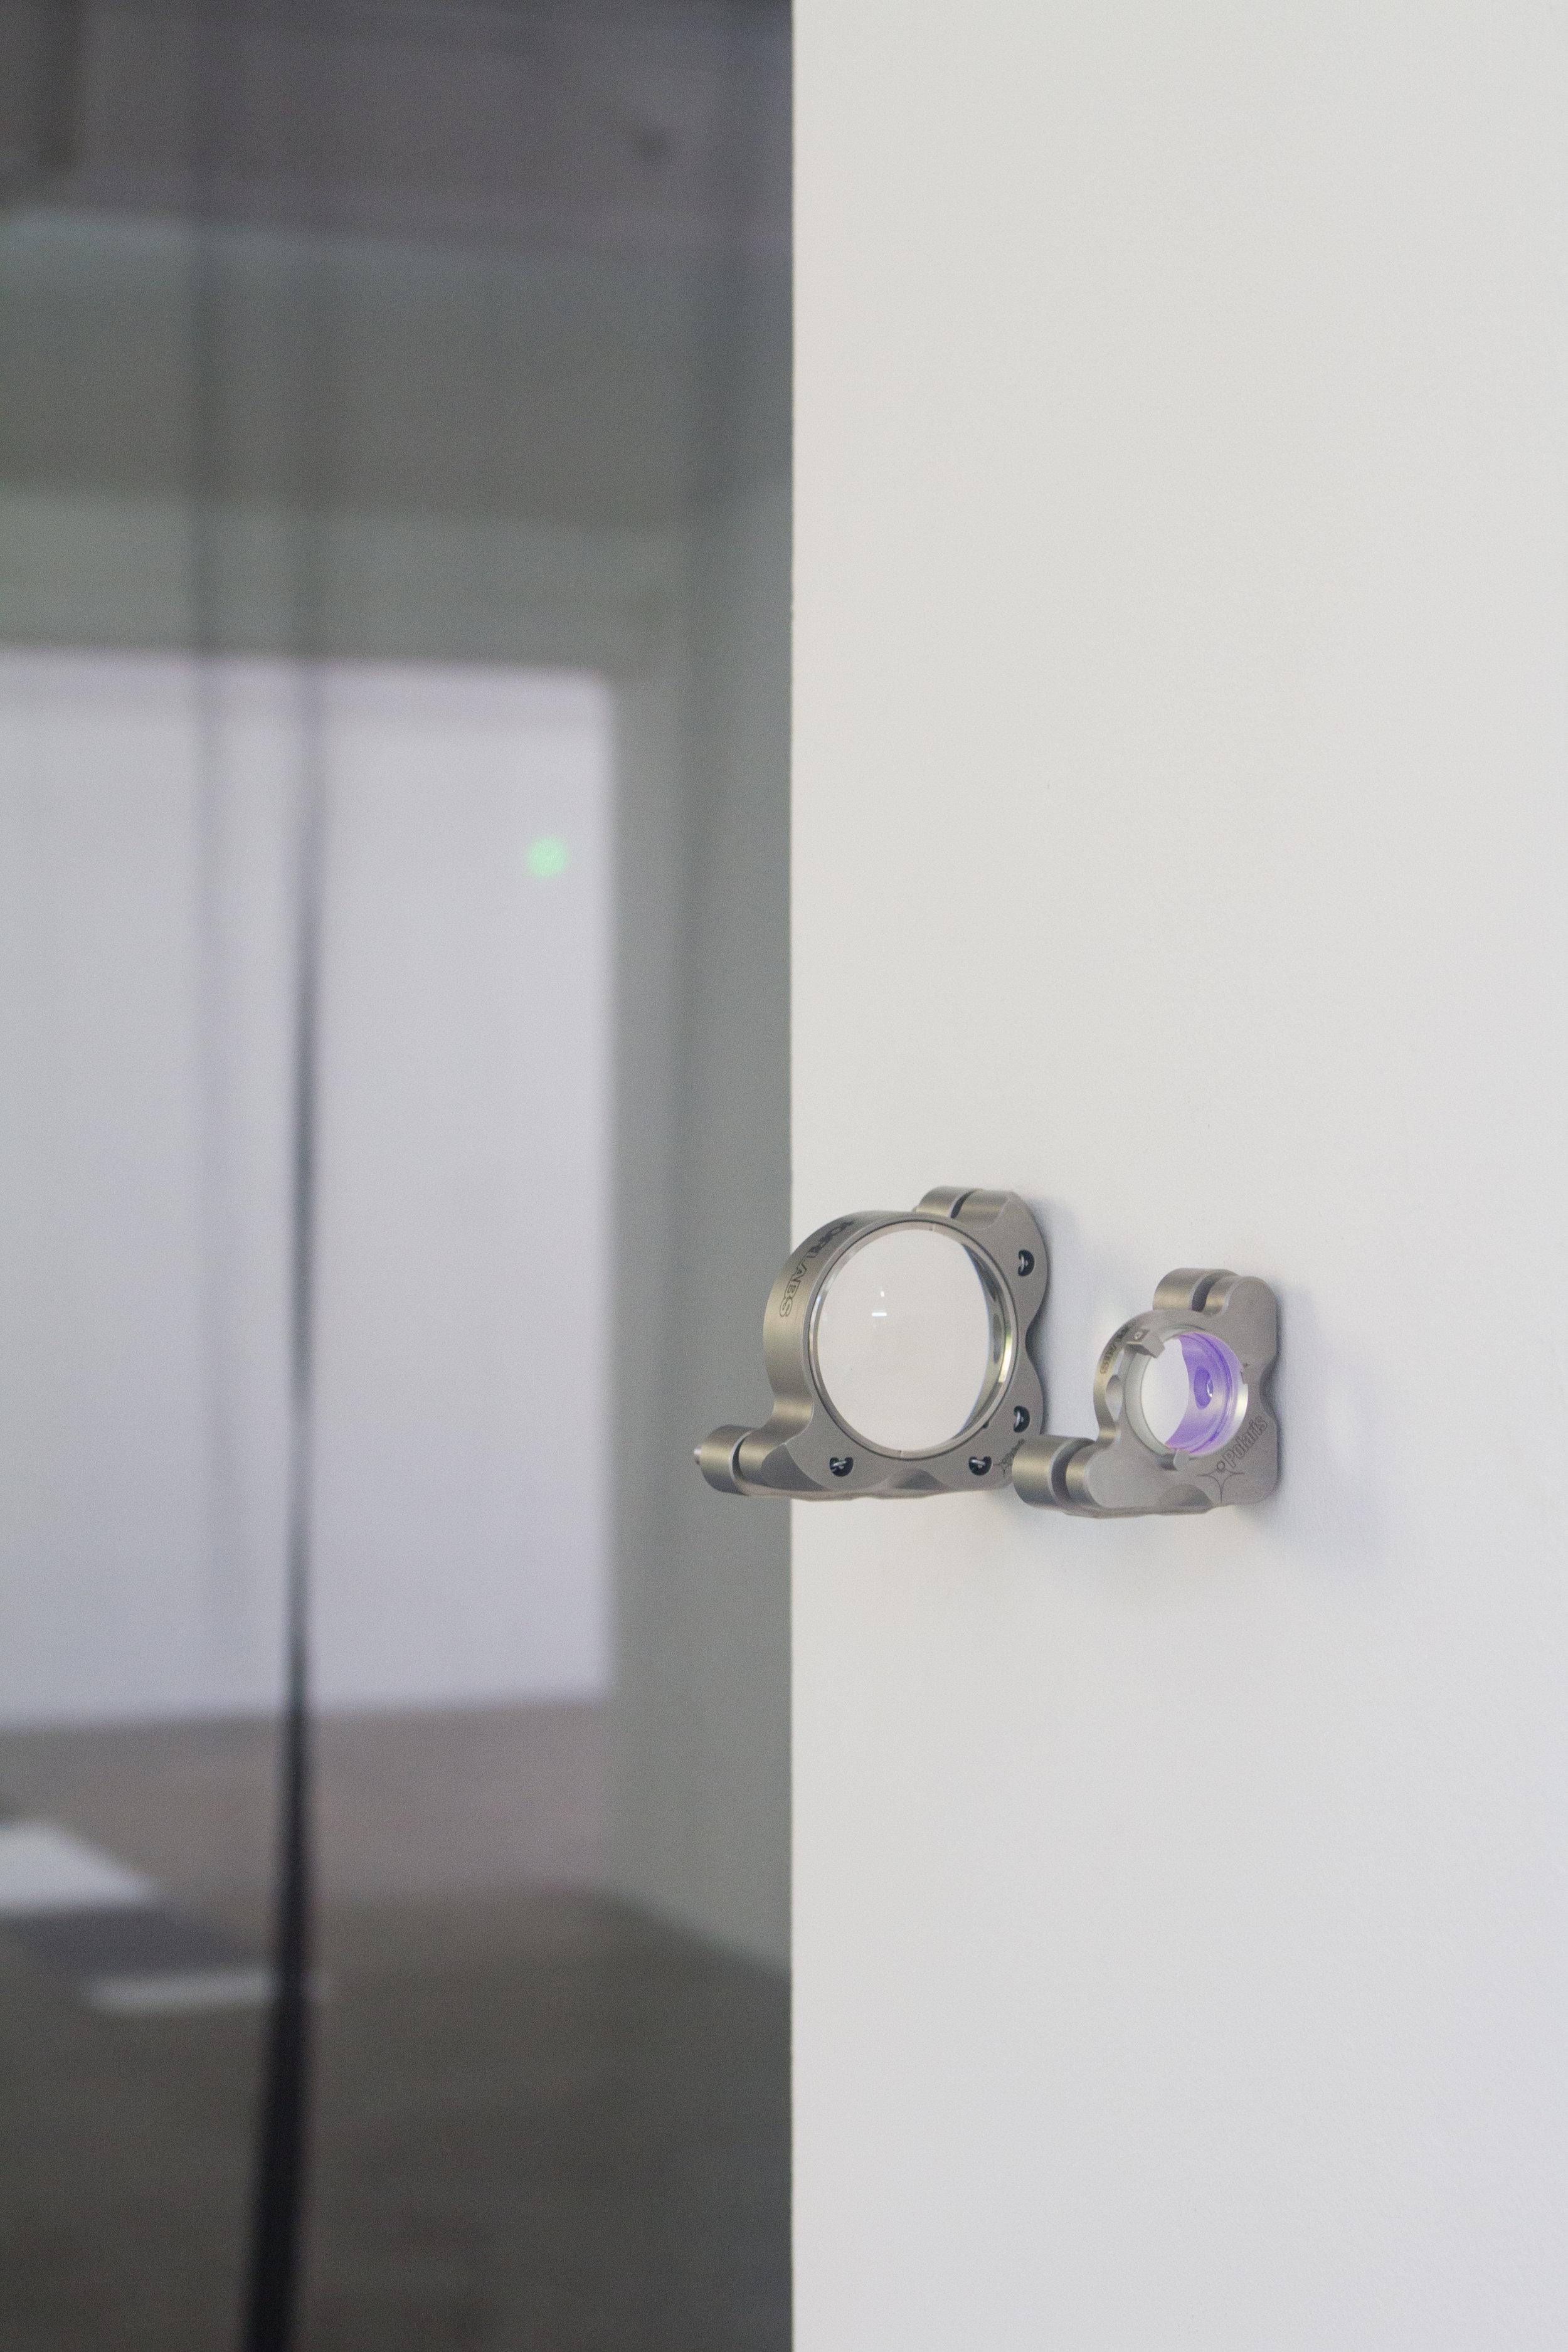 Jason Hendrik Hansma,  Vestibules I , 2018, Quantum optomechanical components, 7 x 5 cm, 5 x 3.5 cm